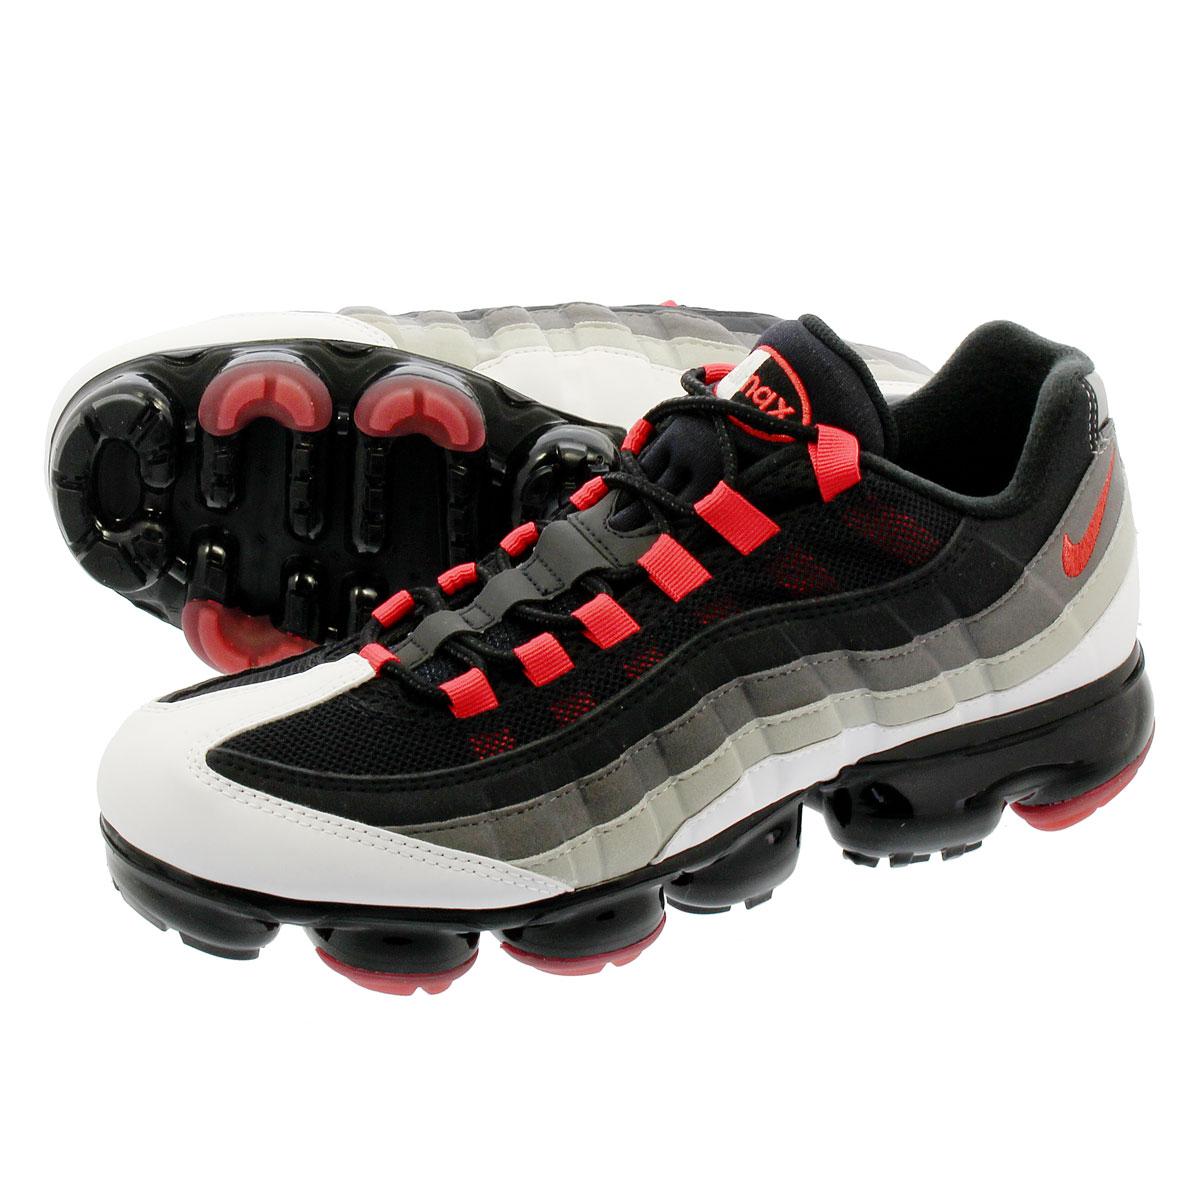 1b27f98c44cd LOWTEX PLUS  NIKE AIR VAPORMAX 95 Nike air vapor max 95 WHITE HOT RED DARK  PEWTER GRANITE aj7292-101